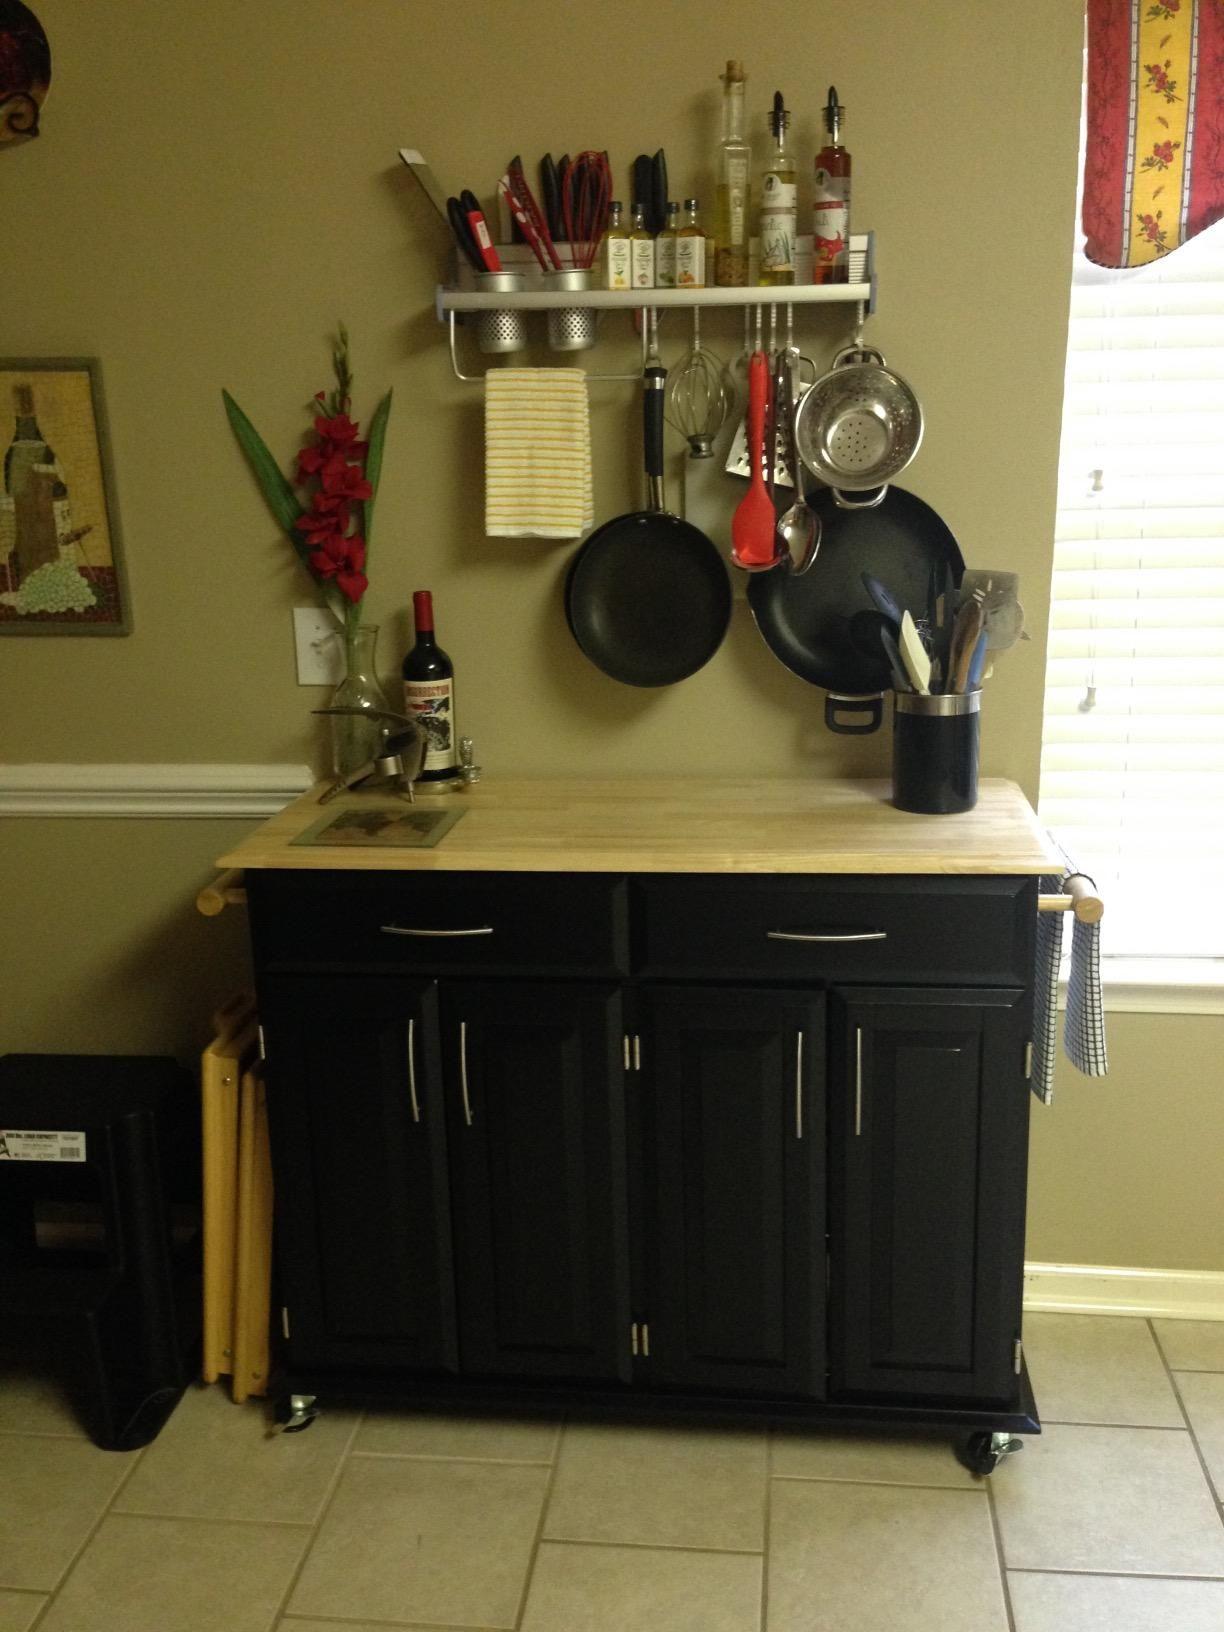 Amazon.com: Kitchen Wall Pot Pan Rack, Plumeet 5 In 1 Wall Mounted Hanging  Kitchen Organizer With 10 Pot Hook U0026 4 Knife Holder U0026 2 Utensil Cup U0026 Spice  Rack ...